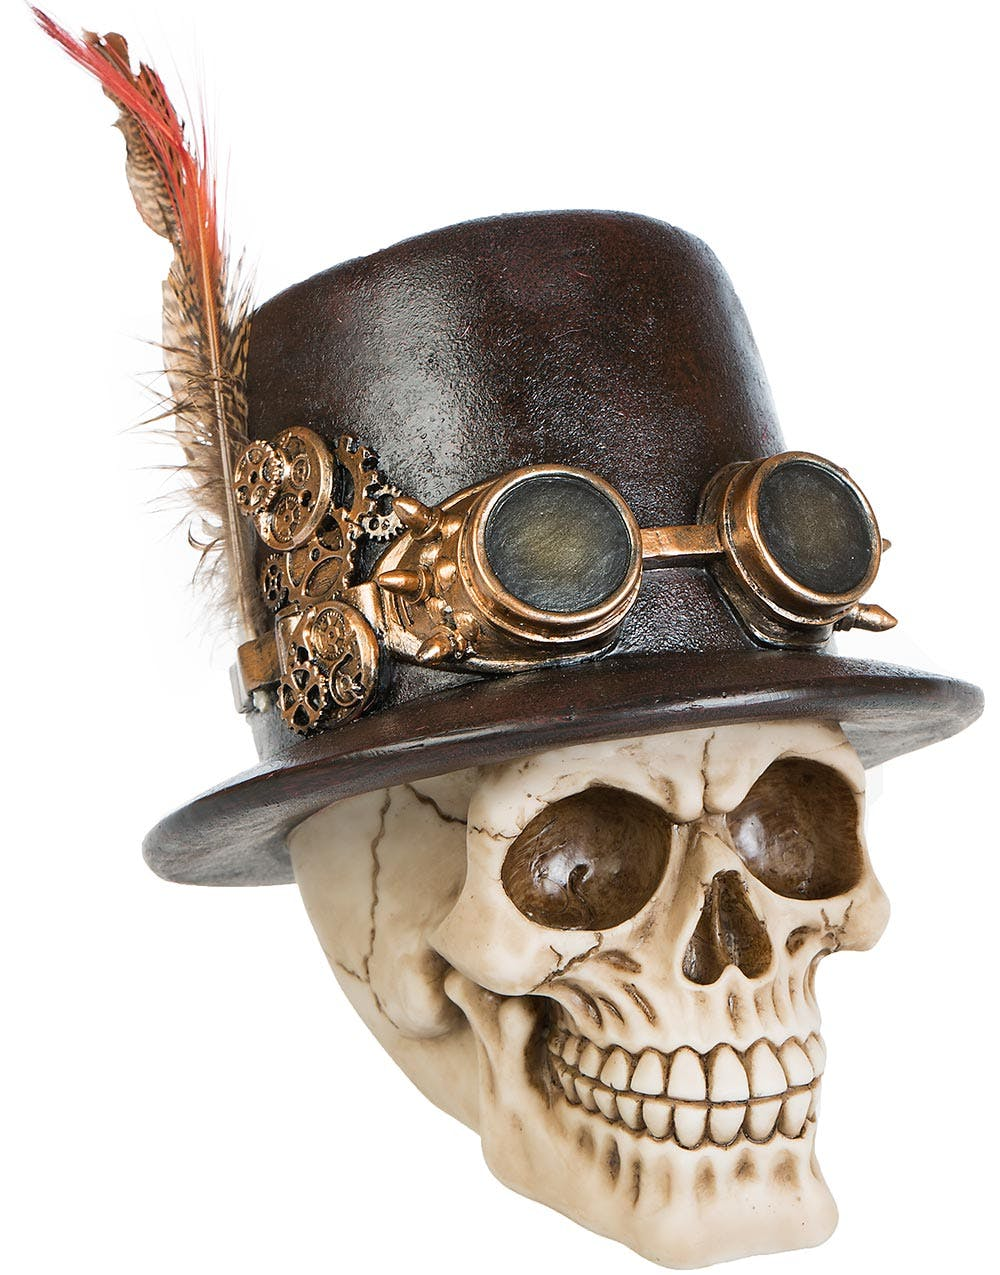 kockums varv anställda Steampunk Top Hat Skull Figur 17 x 18 cm 609c1d7bc628f